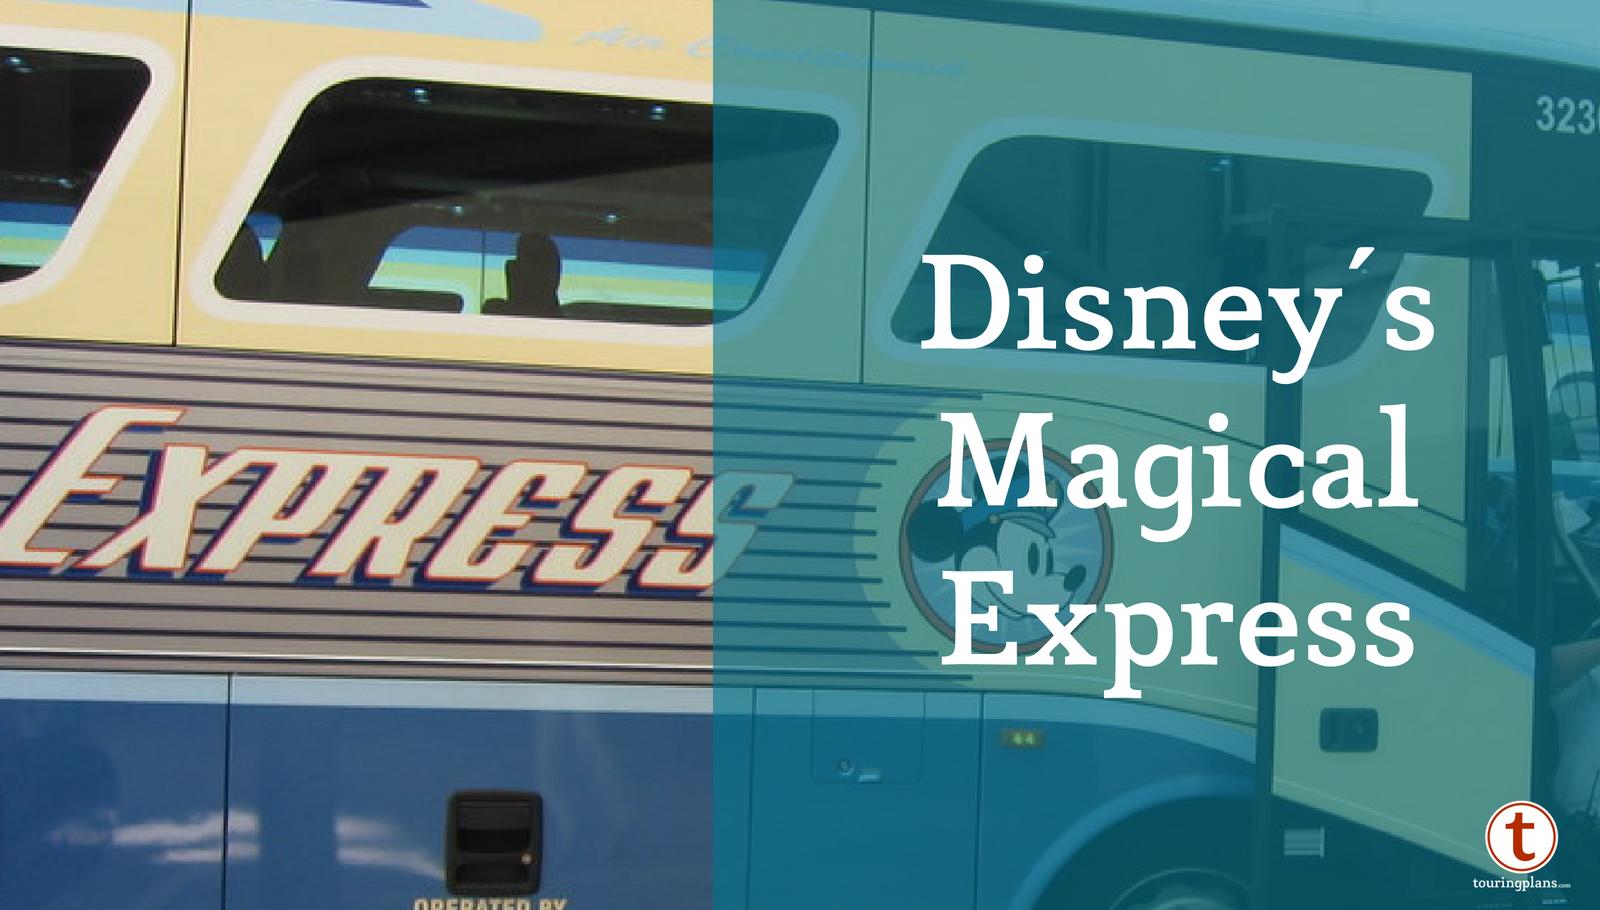 Disney's Magical Express FAQ Update - TouringPlans com Blog